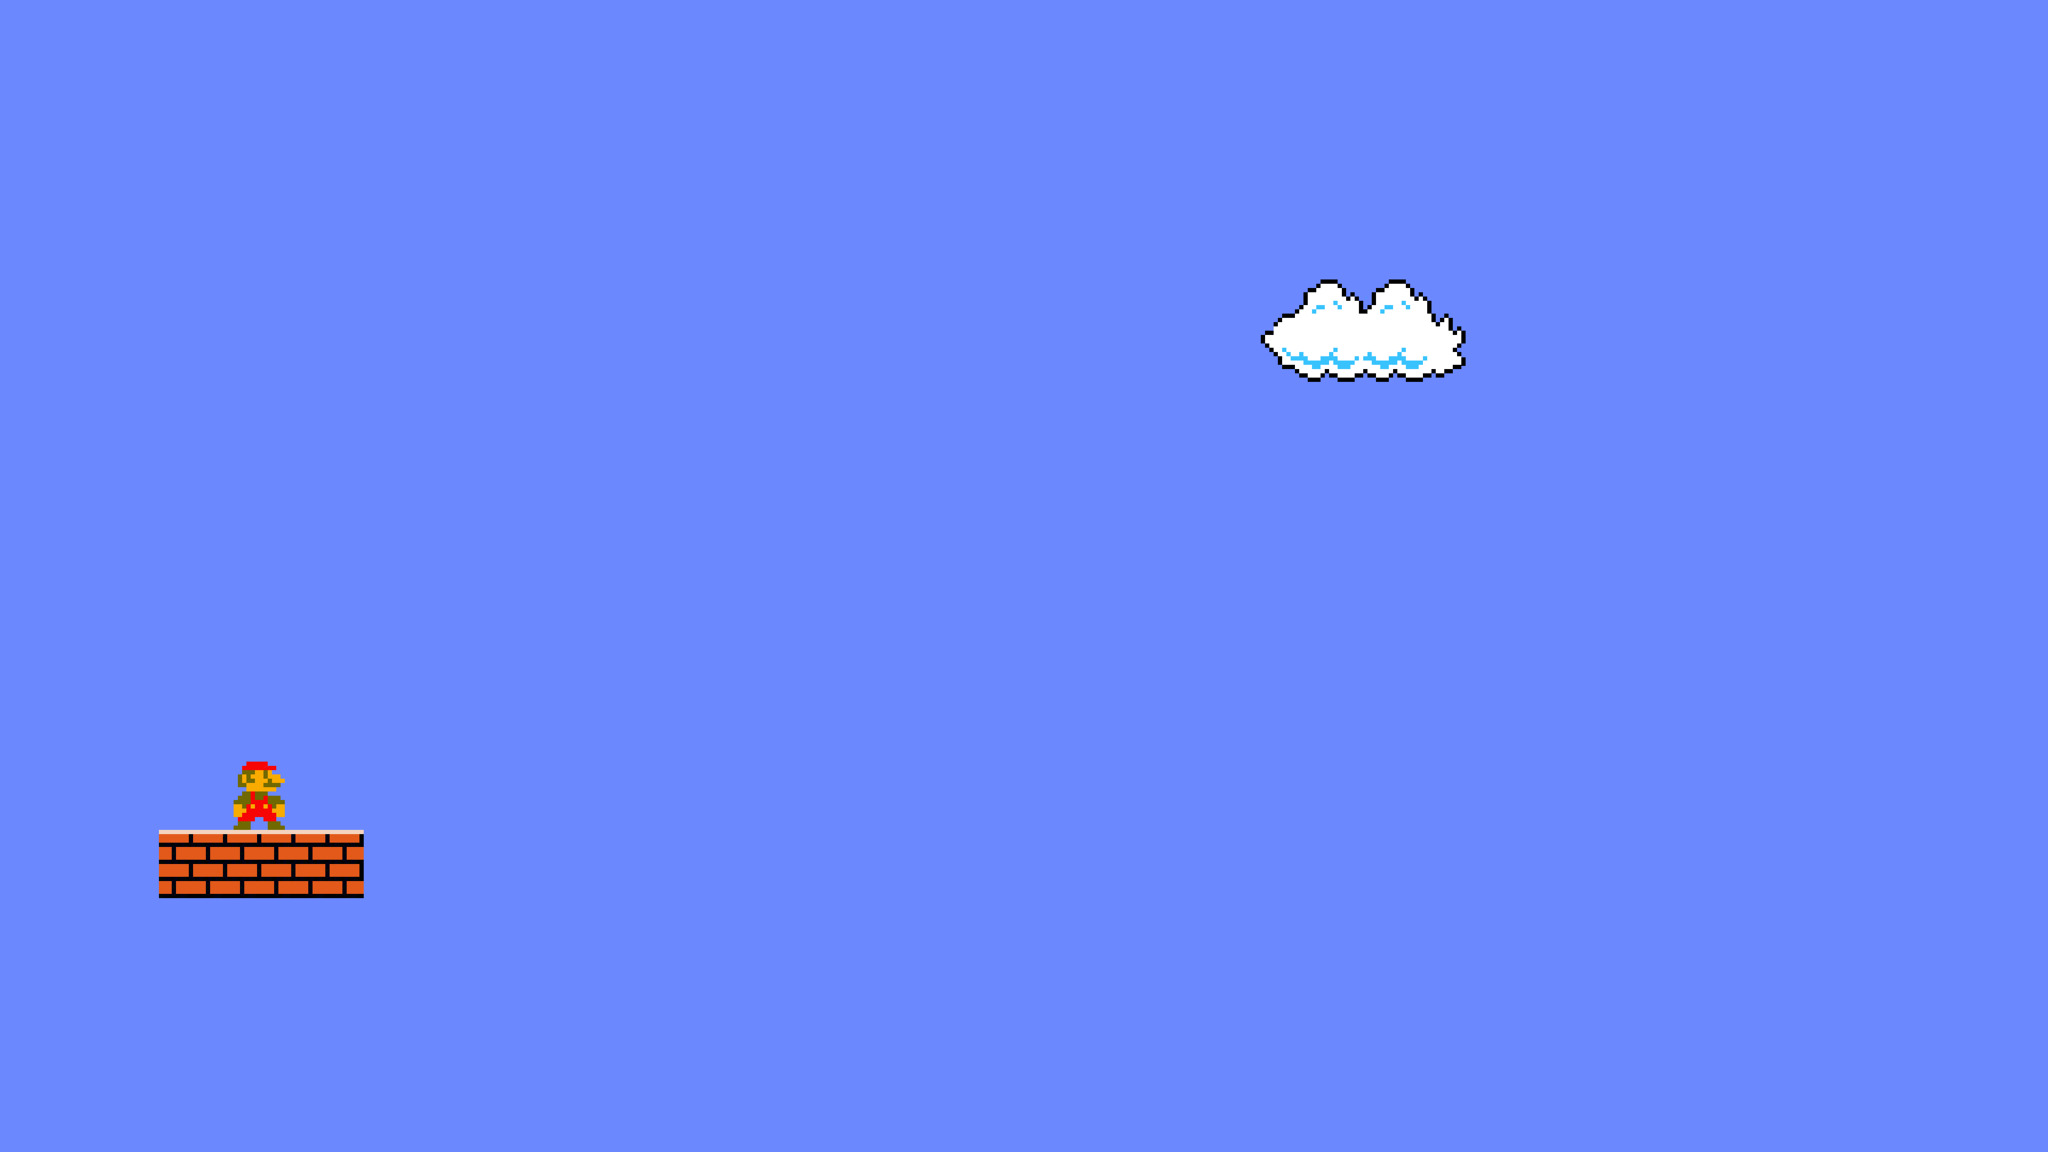 2048x1152 Mario Minimalism 2048x1152 Resolution HD 4k ...